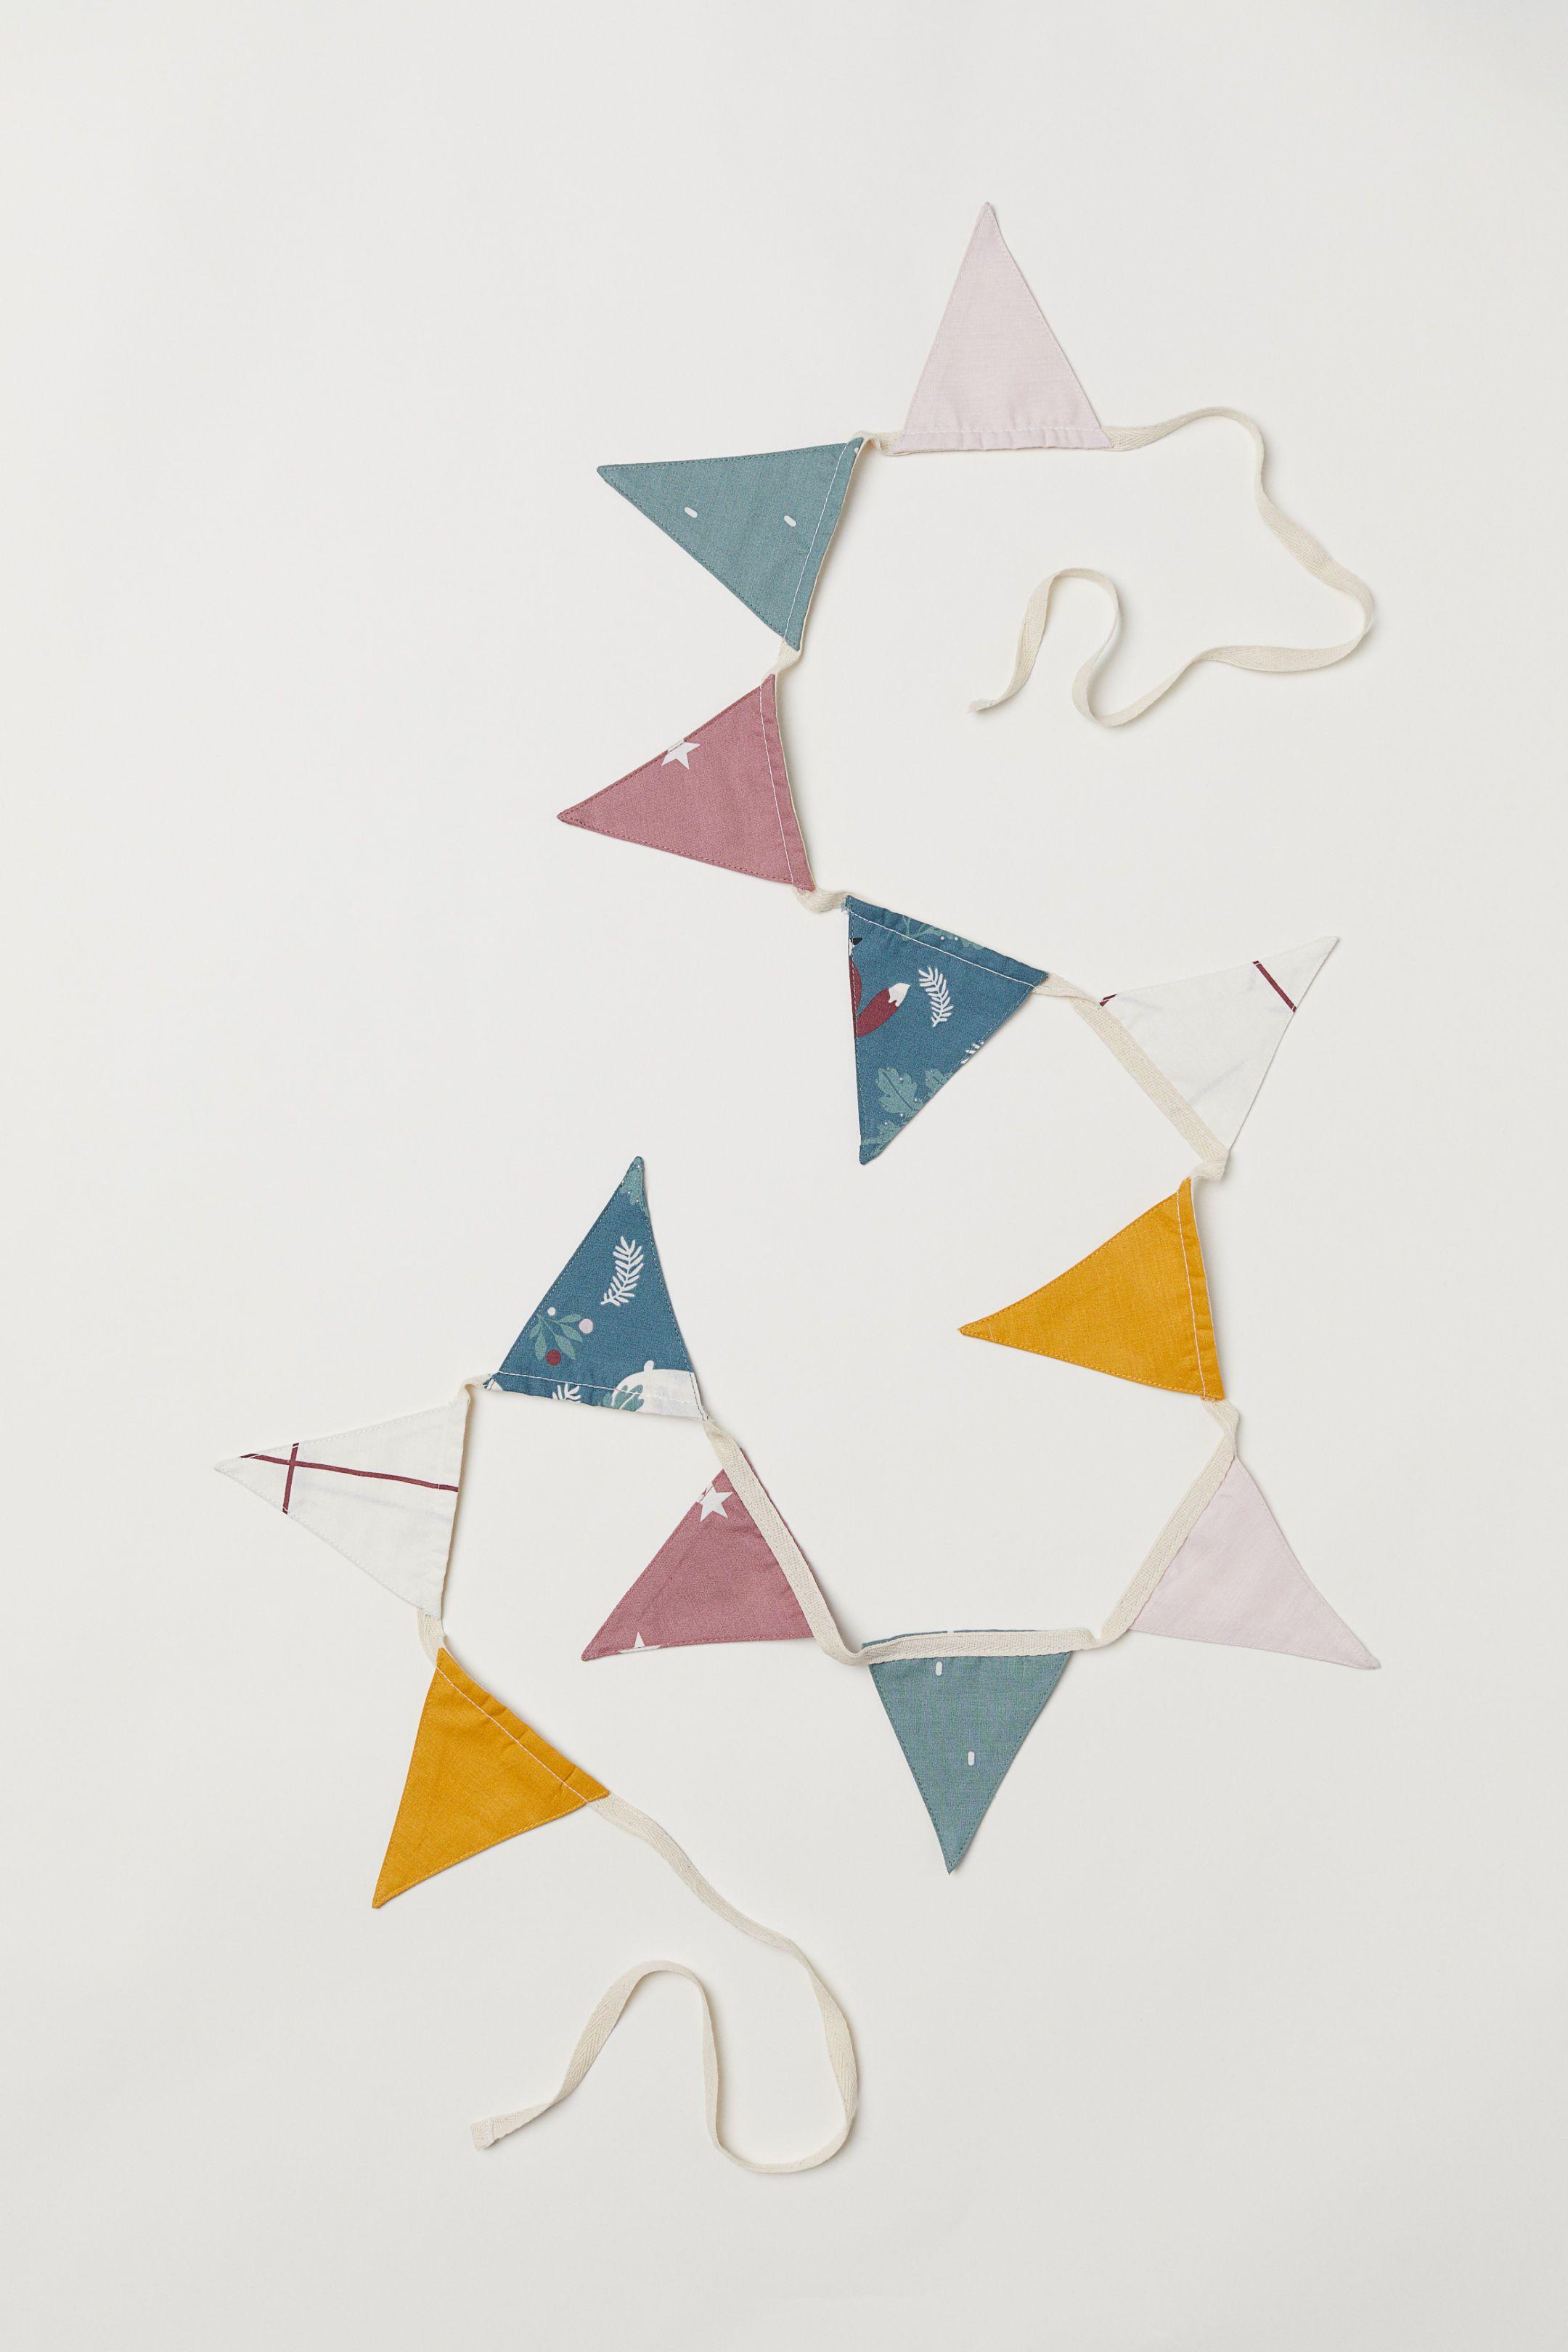 Set Sail Birch Organic Cotton Triangles Flags Pennants